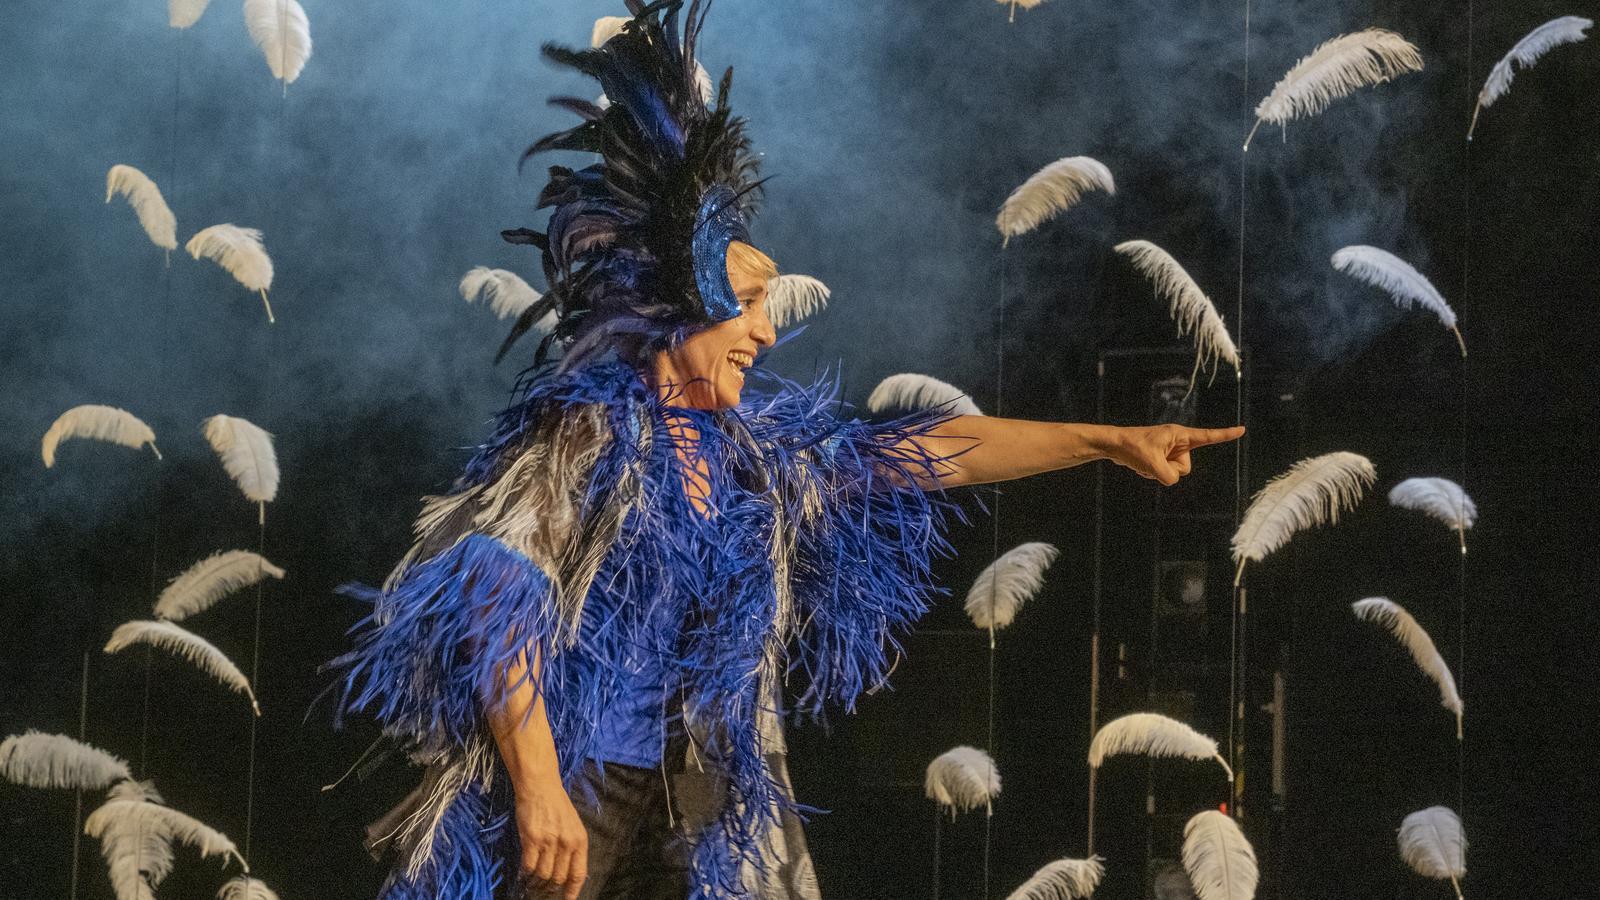 La ballarina i coreògrafa Sol Picó a 'Malditas plumas'